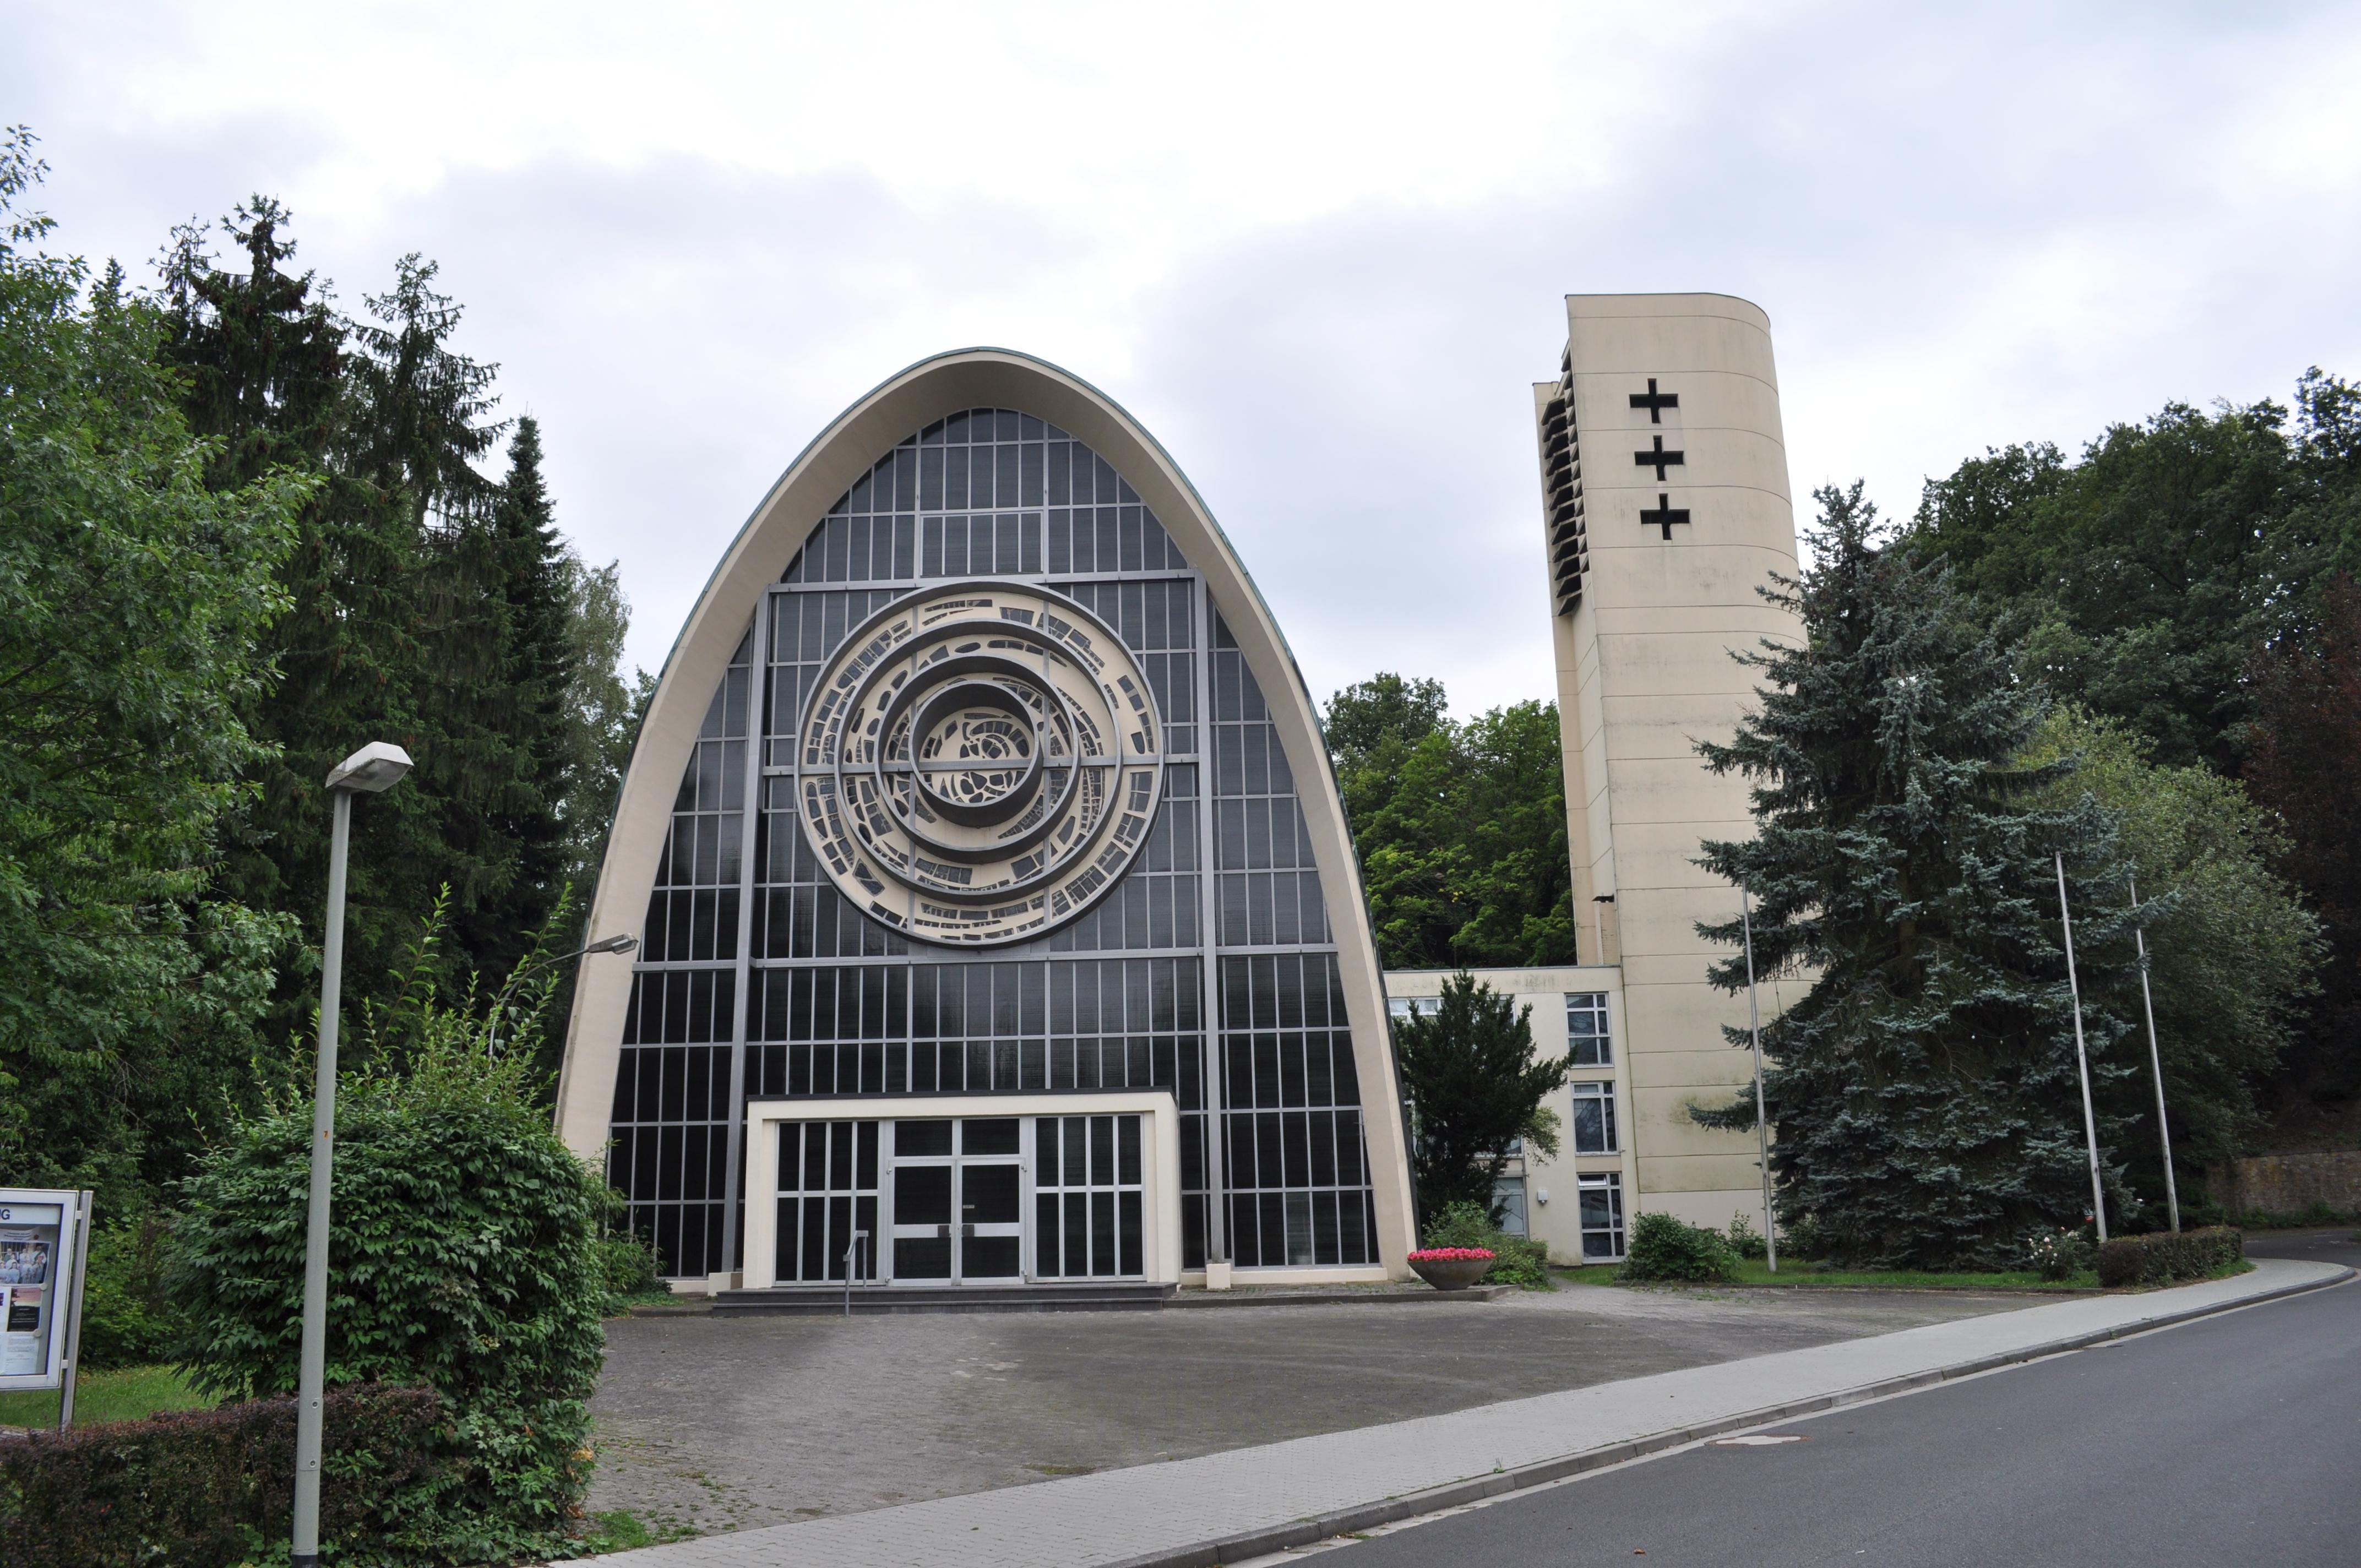 Katholische kirche st hedwig oberursel